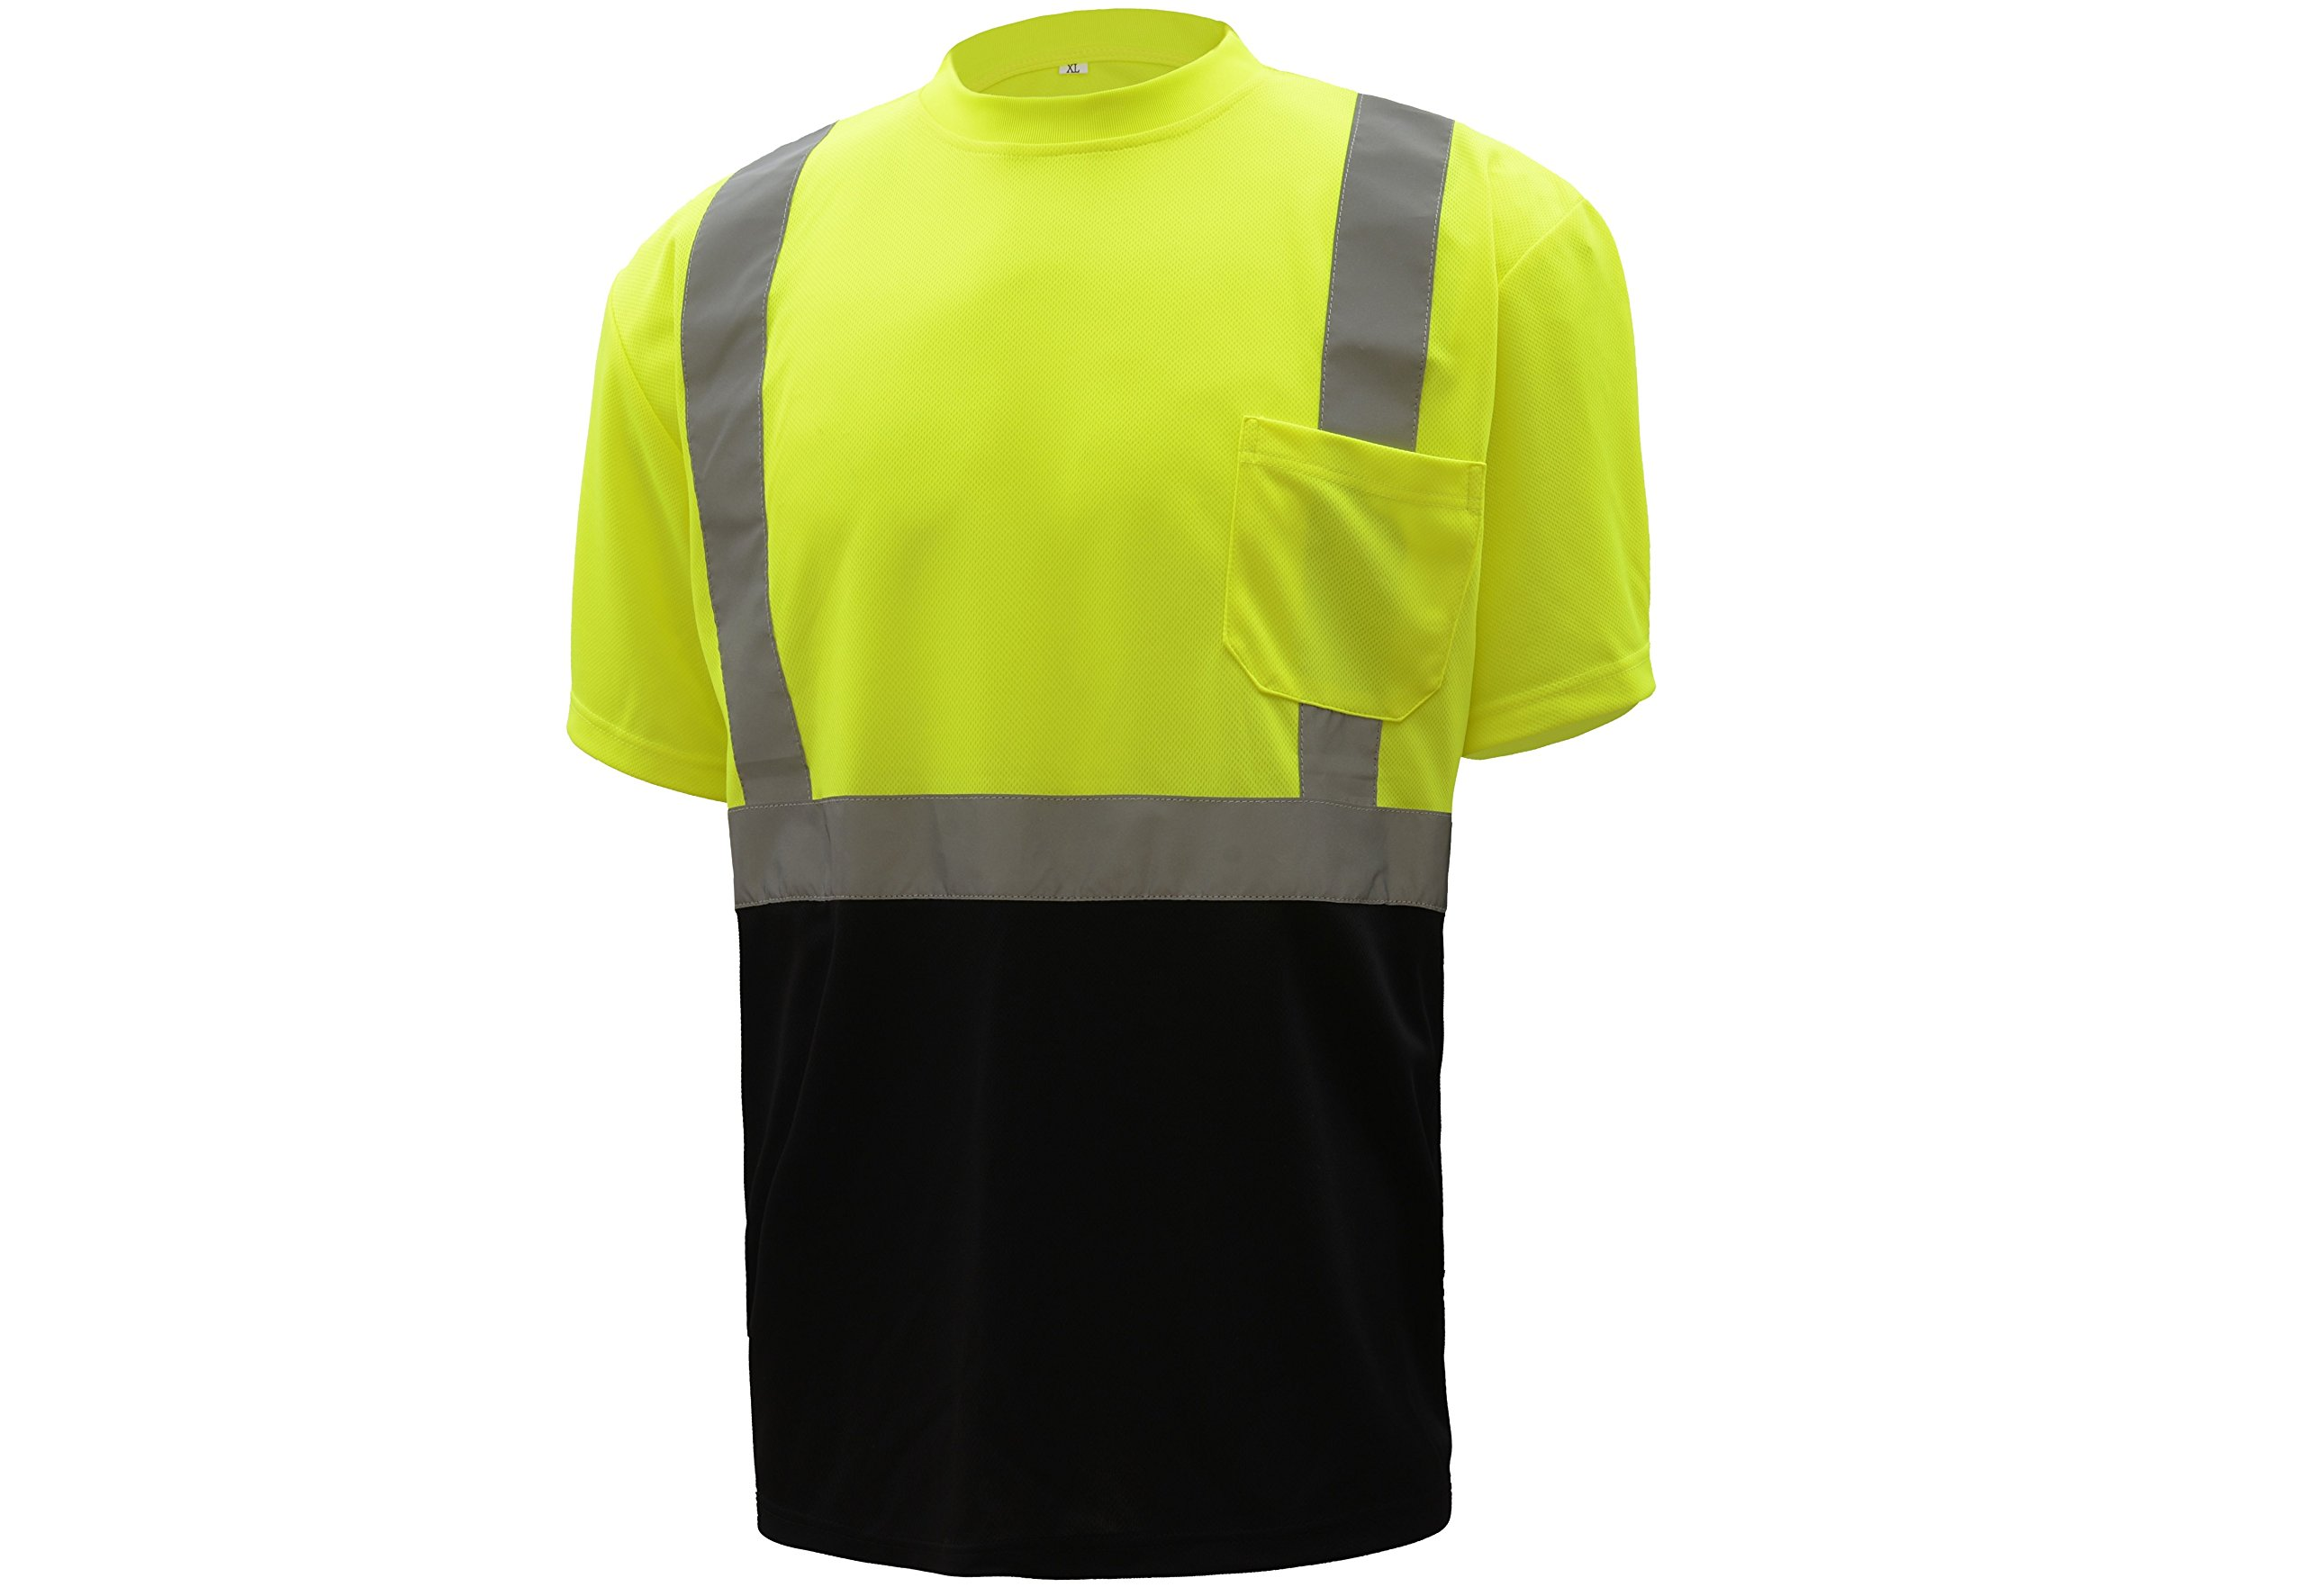 CJ Safety CJHVTS2003 ANSI Class 2 High Vis Short Sleeve Black Bottom Safety Shirt Moisture Wicking Mesh (Large, Green)